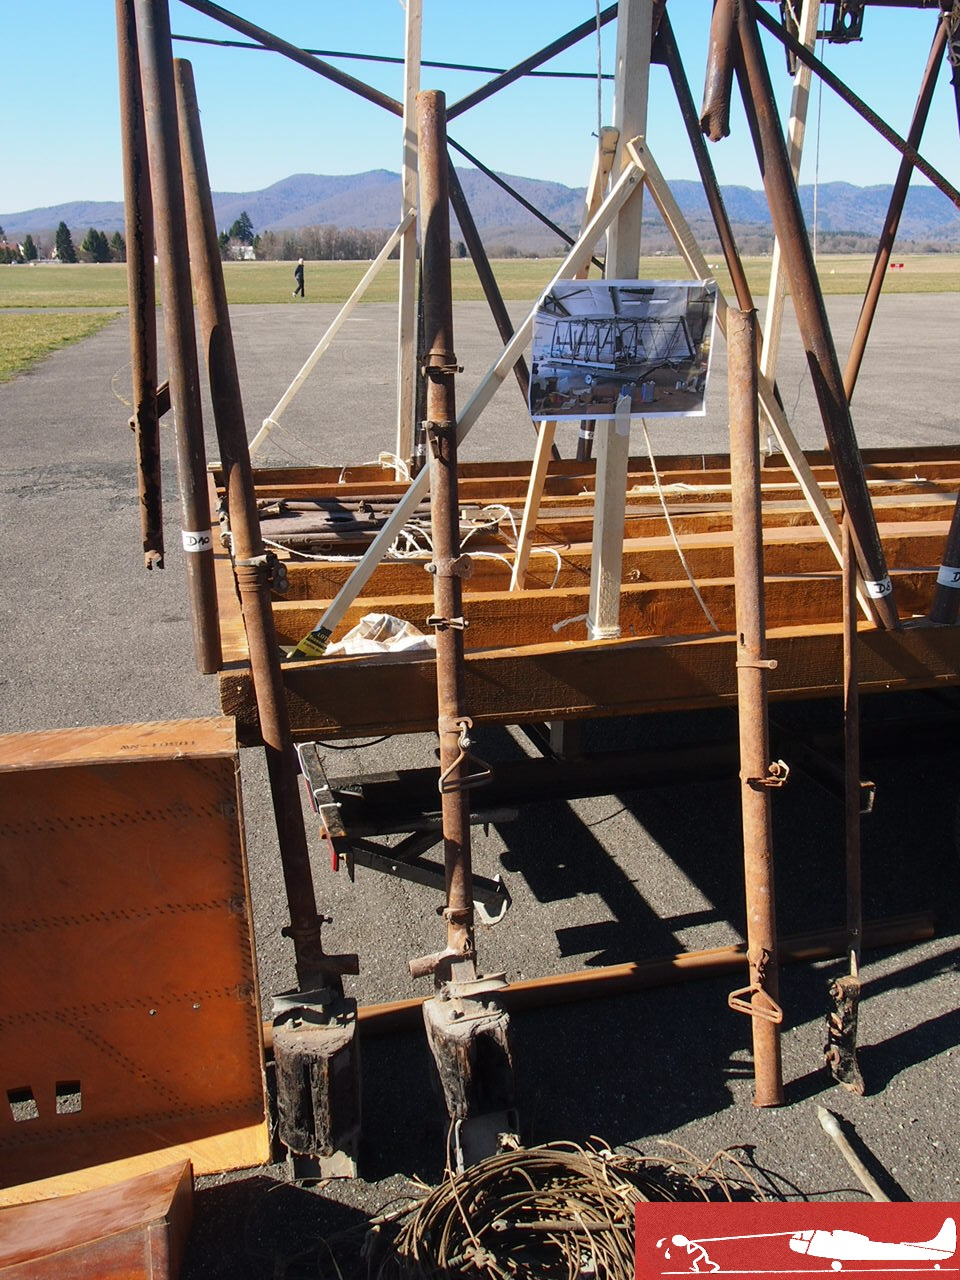 [Gliderborne] Restauration planeur WACO CG-4A P4179761